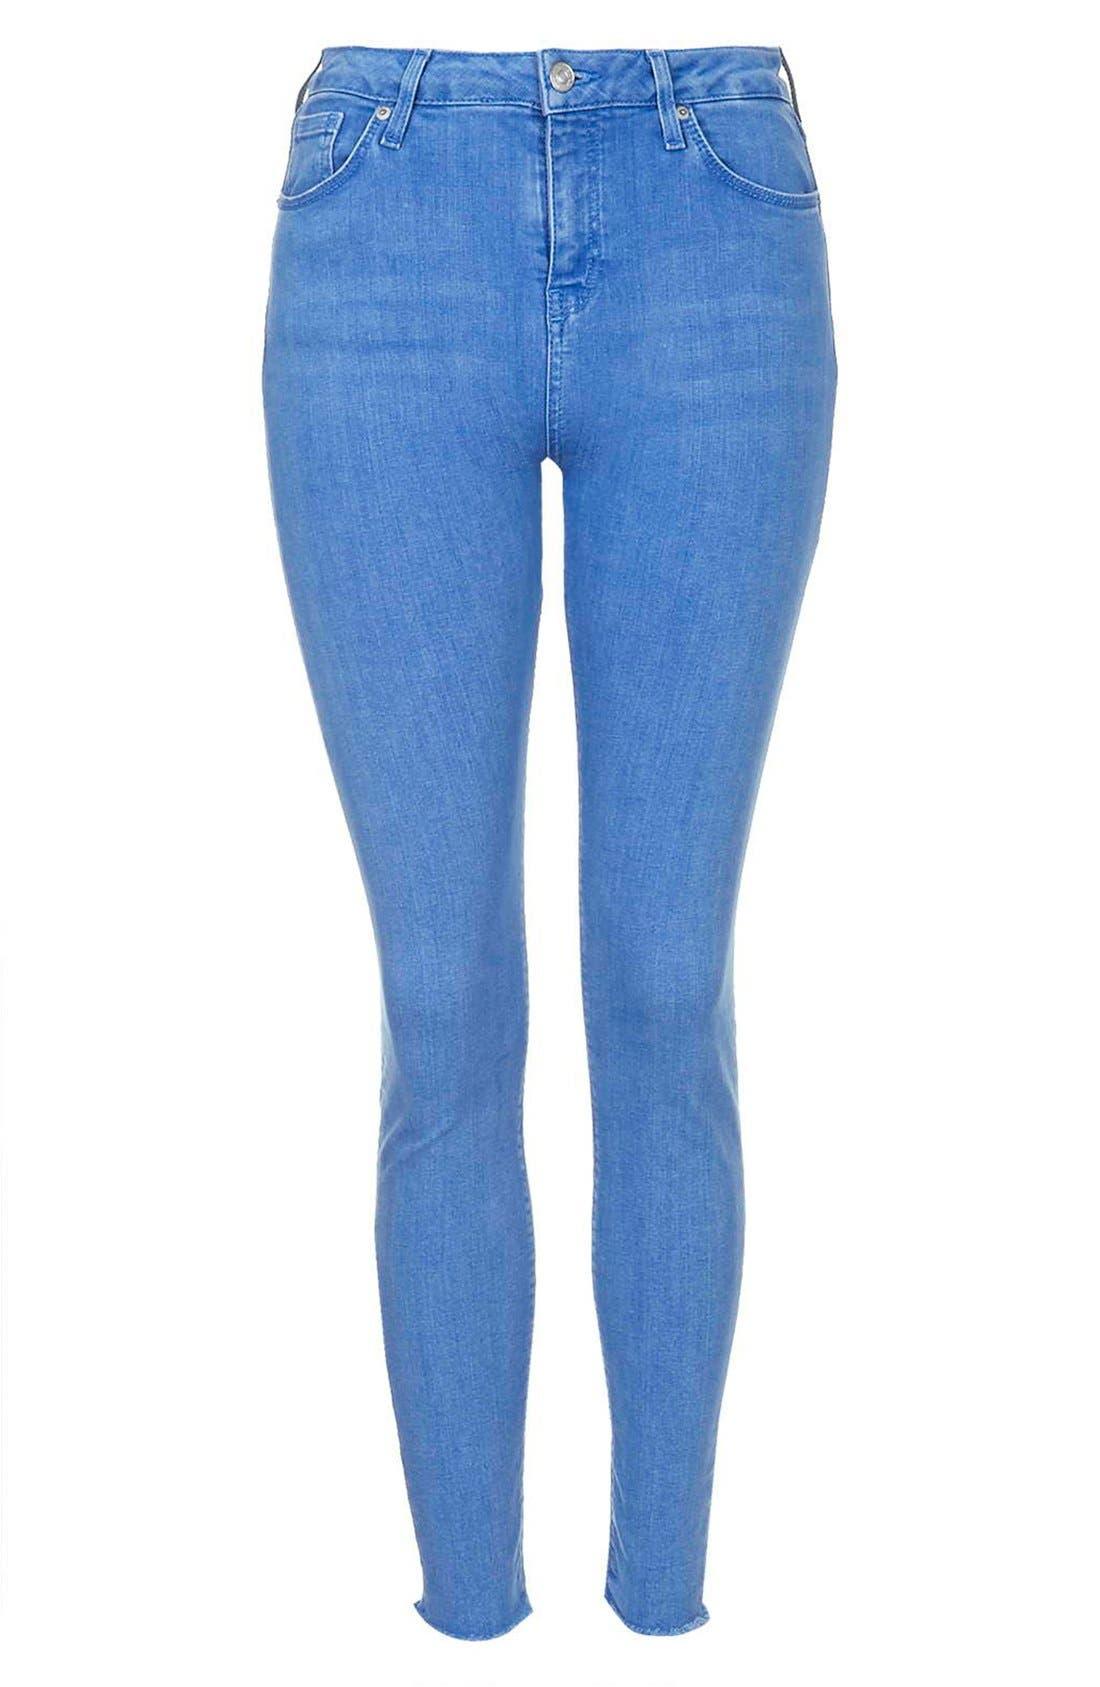 Alternate Image 3  - Topshop Moto 'Jamie' High Waist Skinny Jeans (Blue) (Short)